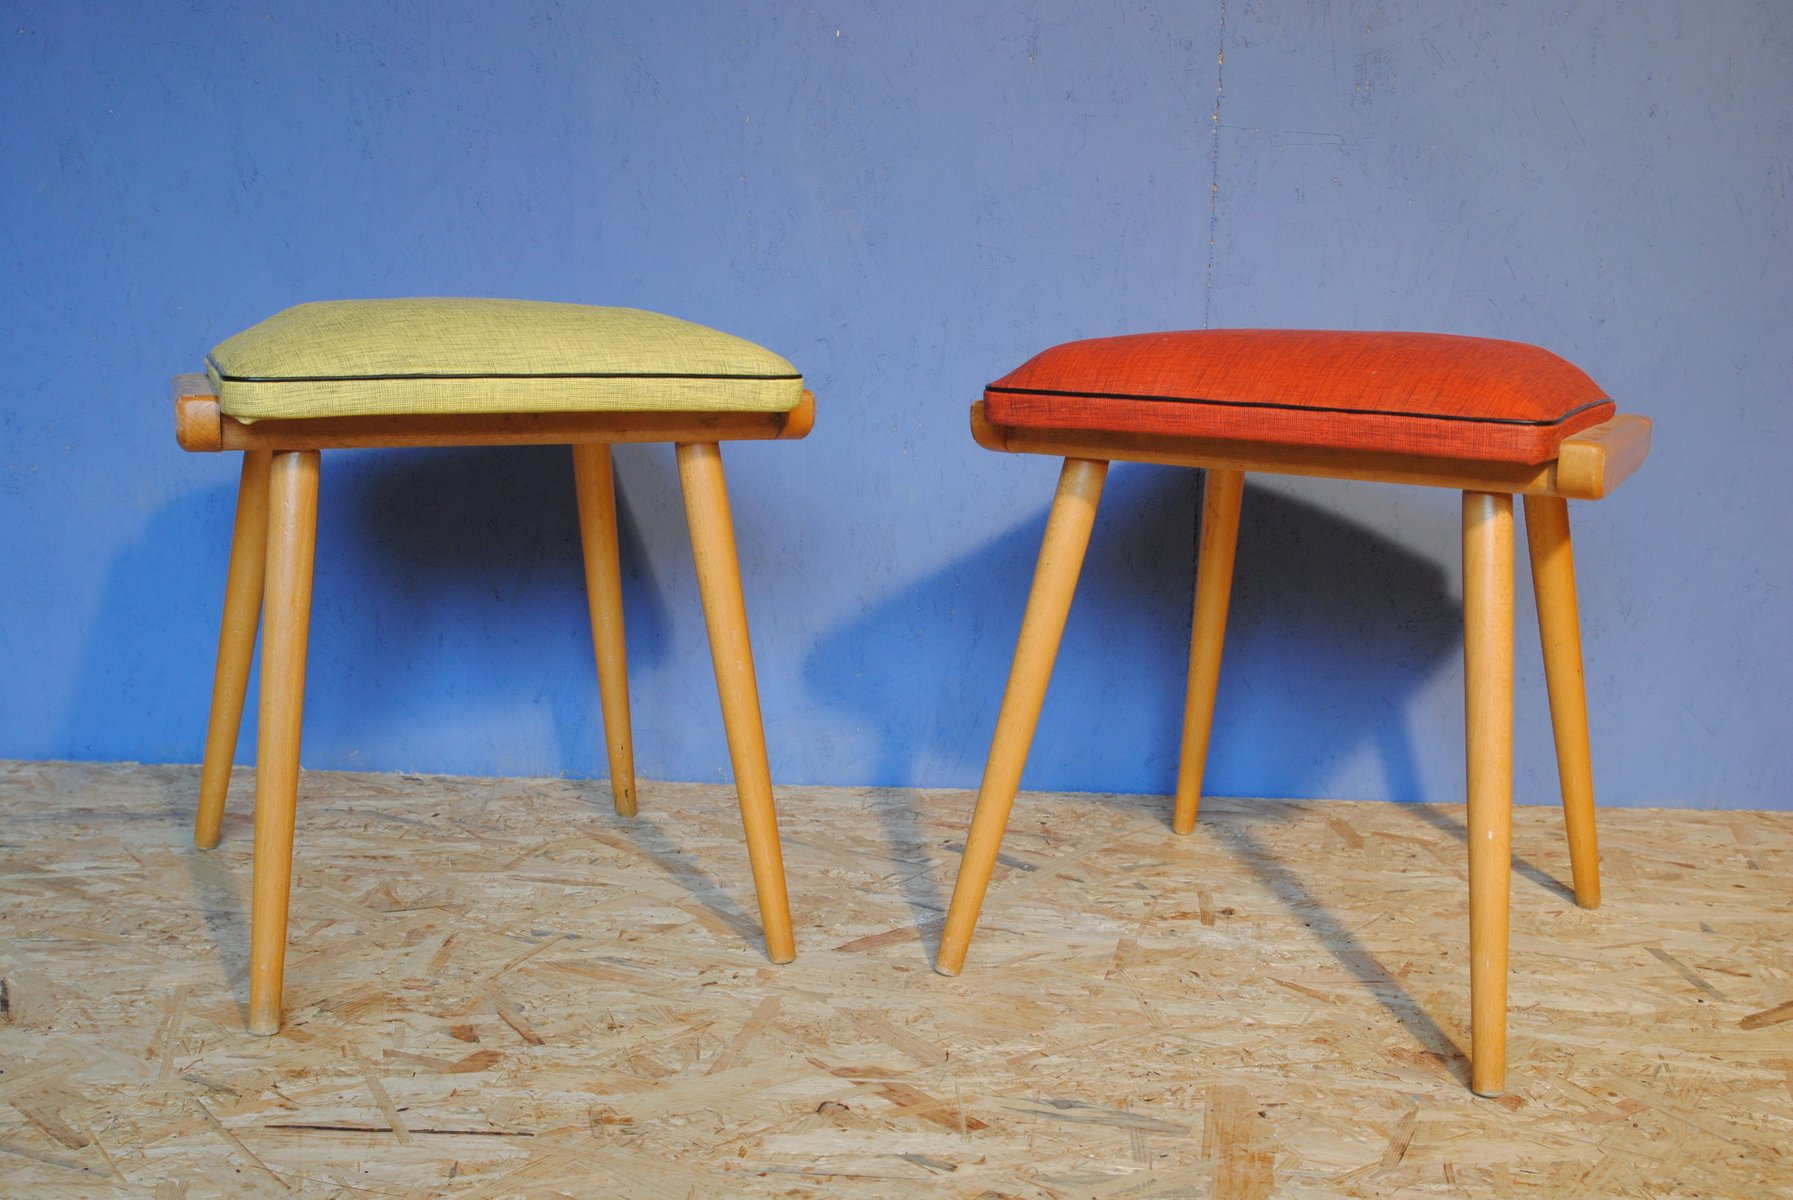 mid century hocker aus holz vinyl 1950er 2er set bei pamono kaufen. Black Bedroom Furniture Sets. Home Design Ideas